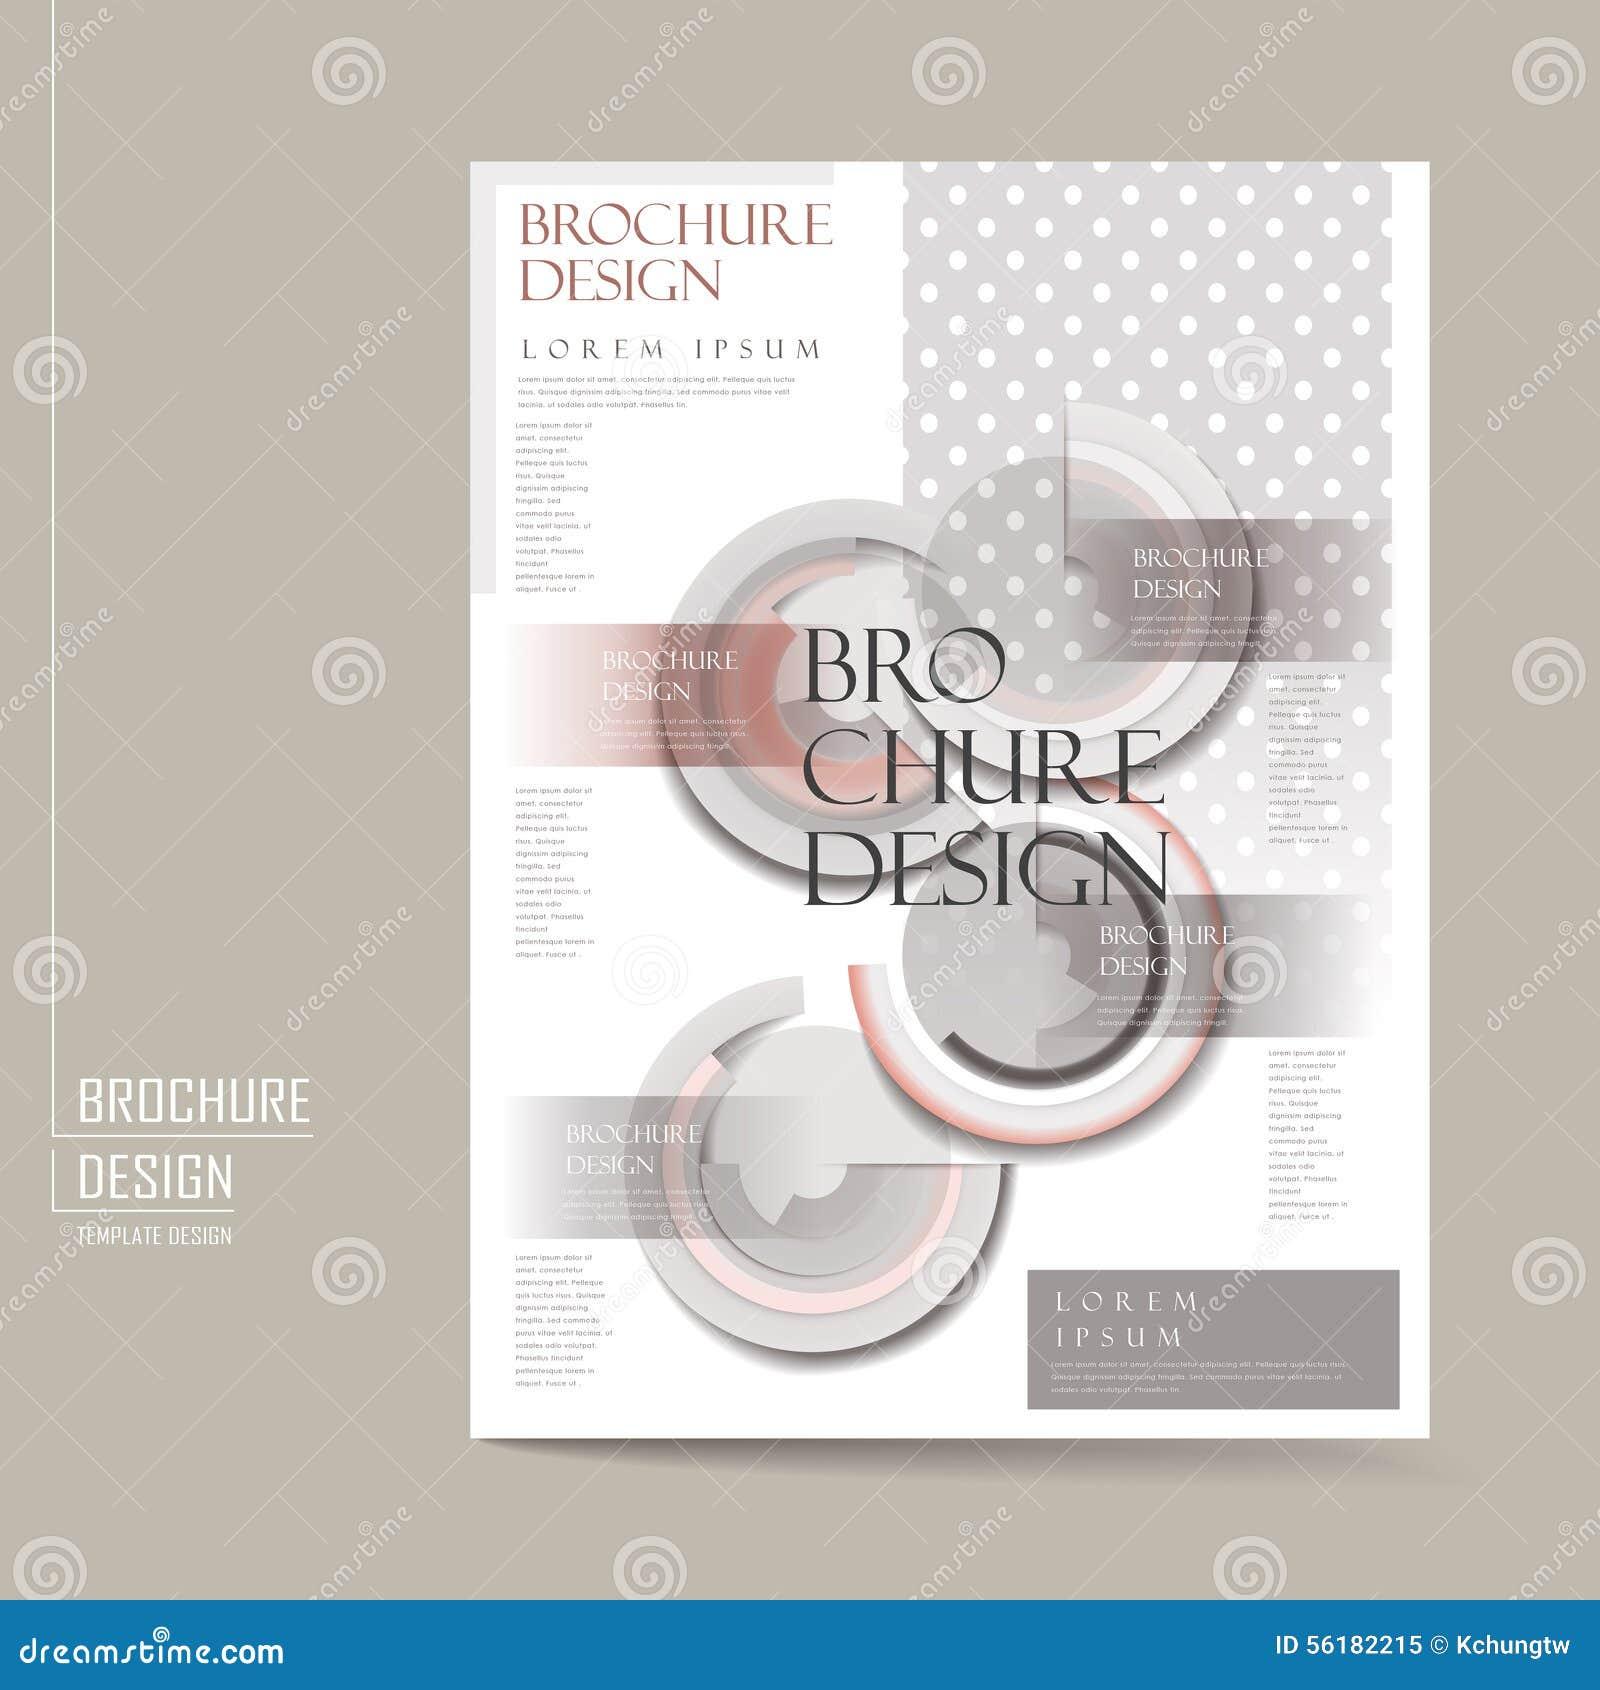 Elegant Brochure Template Design Stock Vector Illustration Of